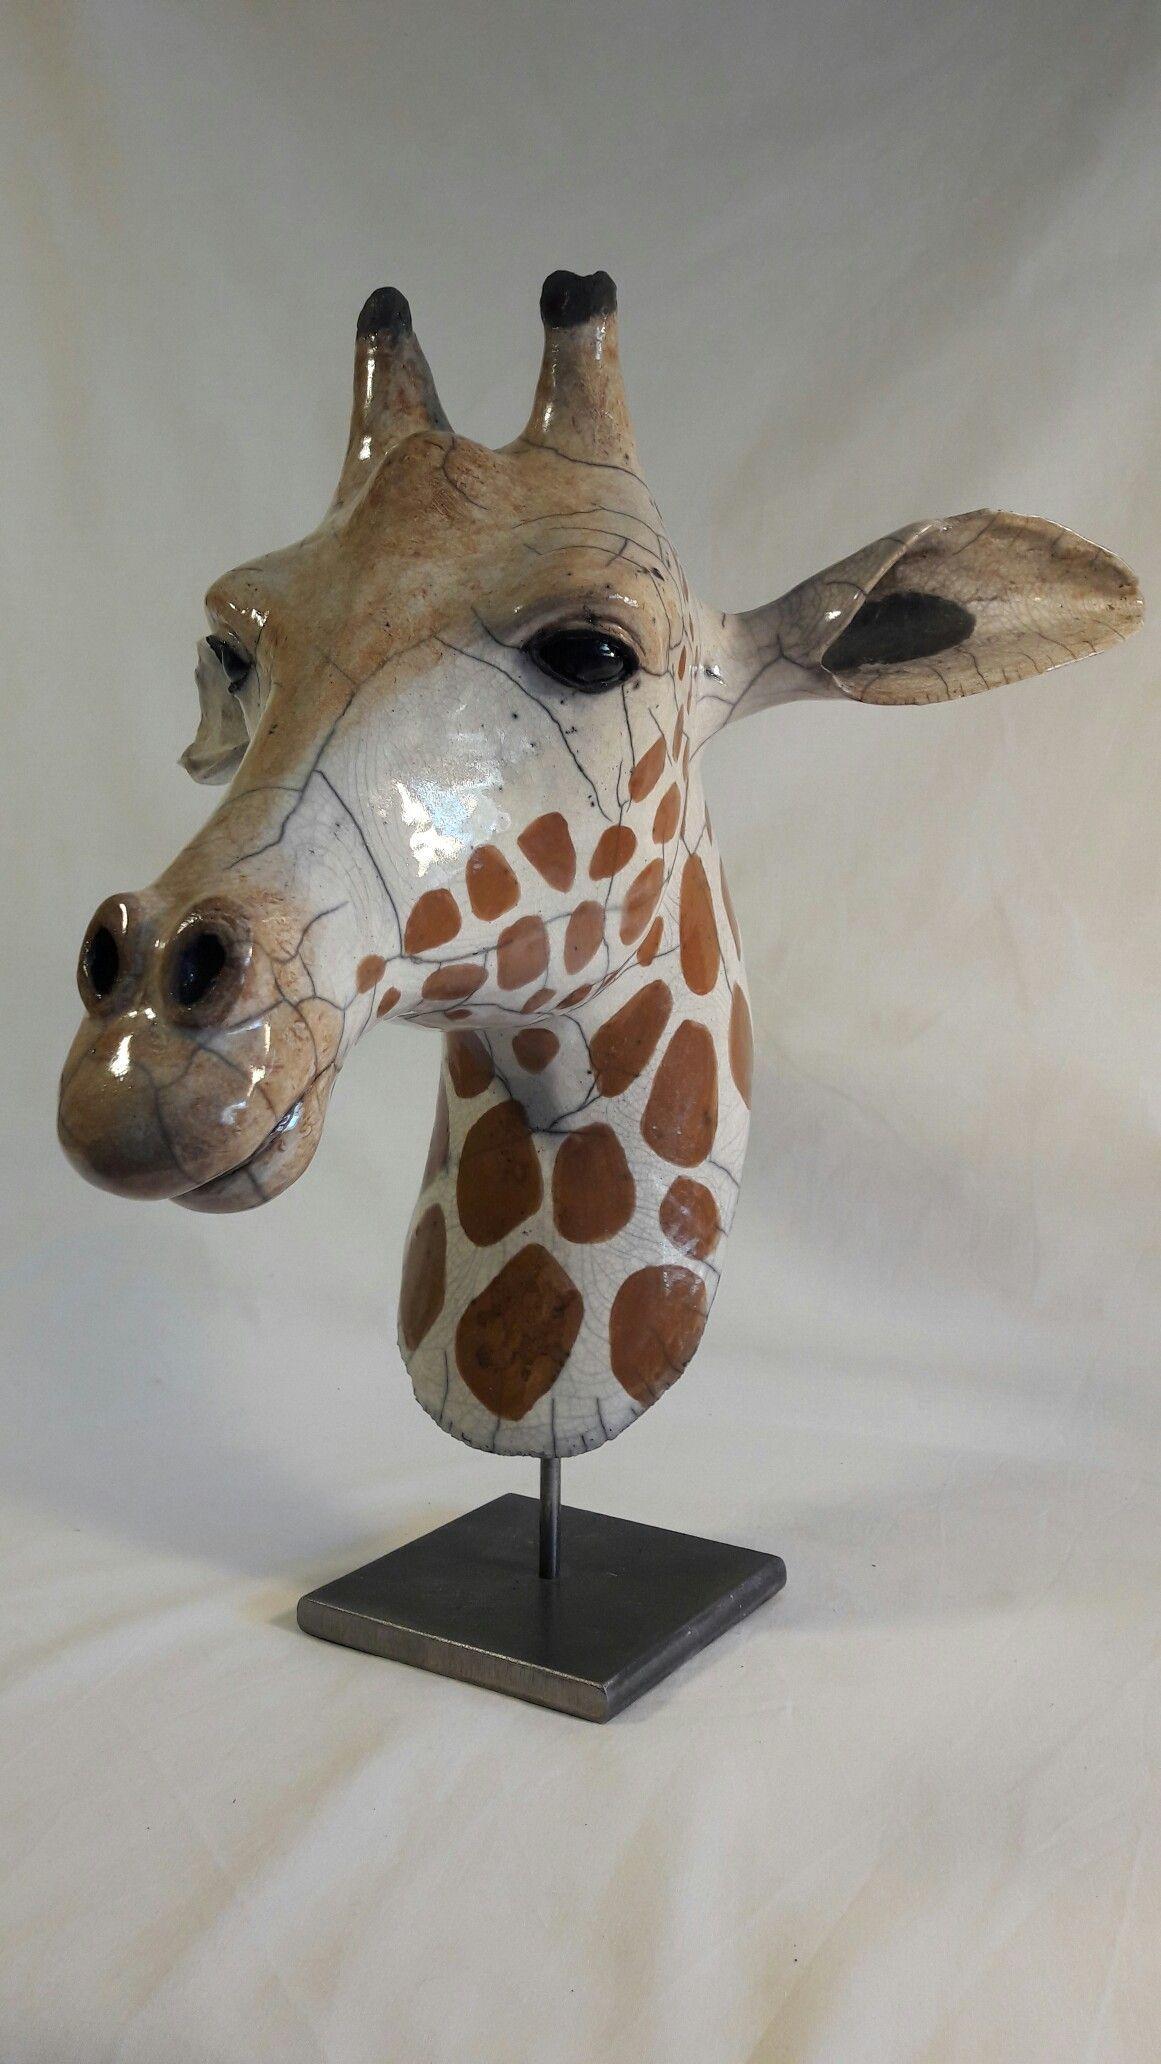 Pin By Hettie Mienie On Animals Pinterest Ceramics